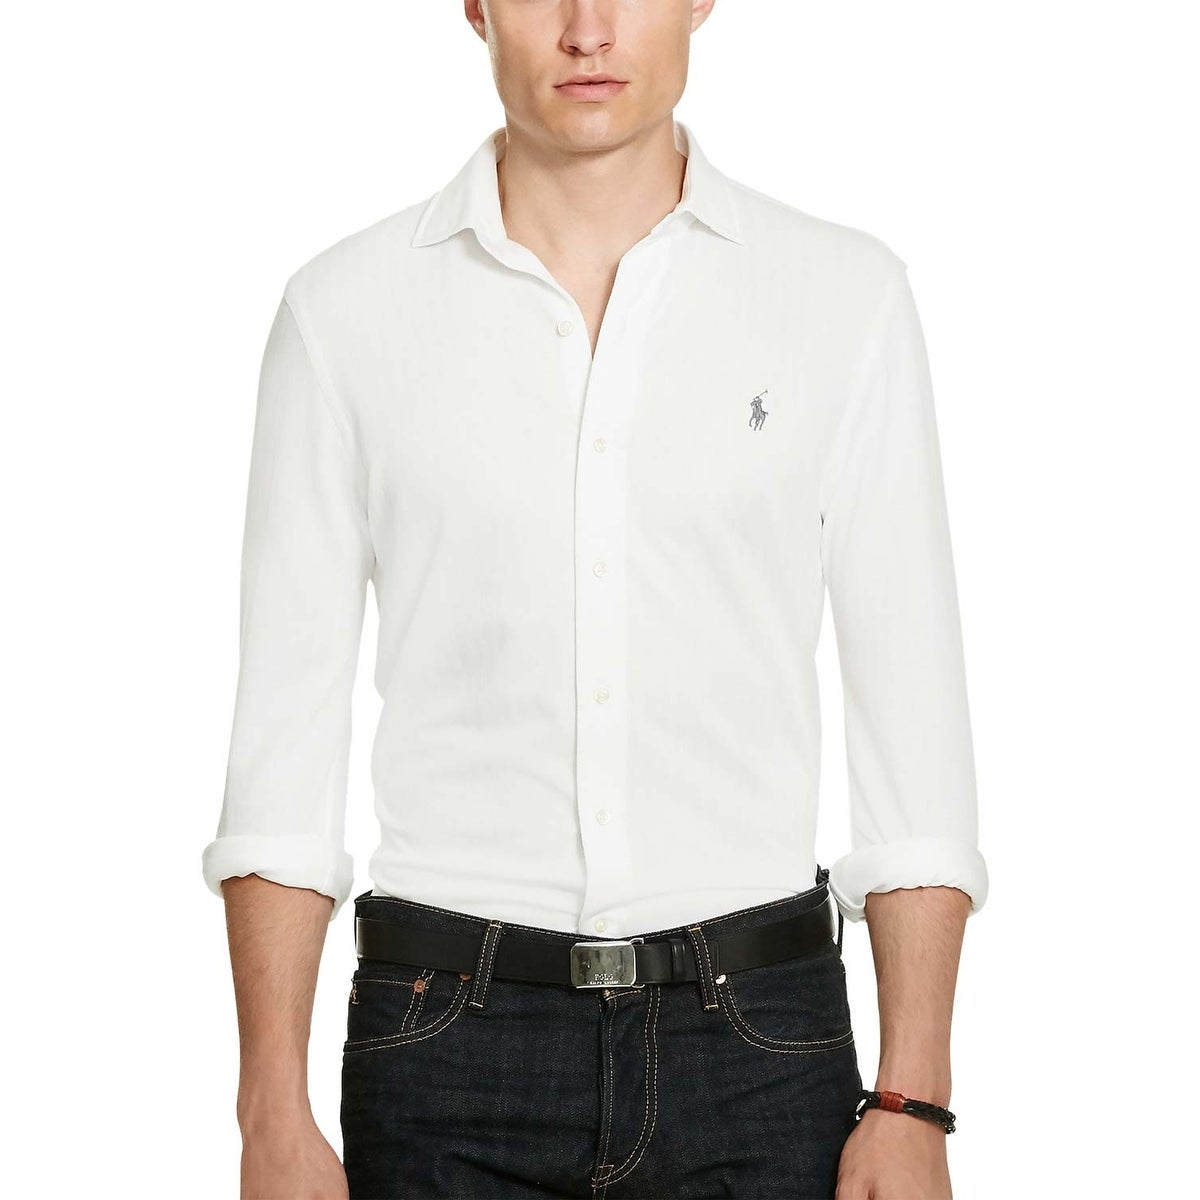 Shop Polo Ralph Lauren White Herringbone Knit Dress Shirt Large L